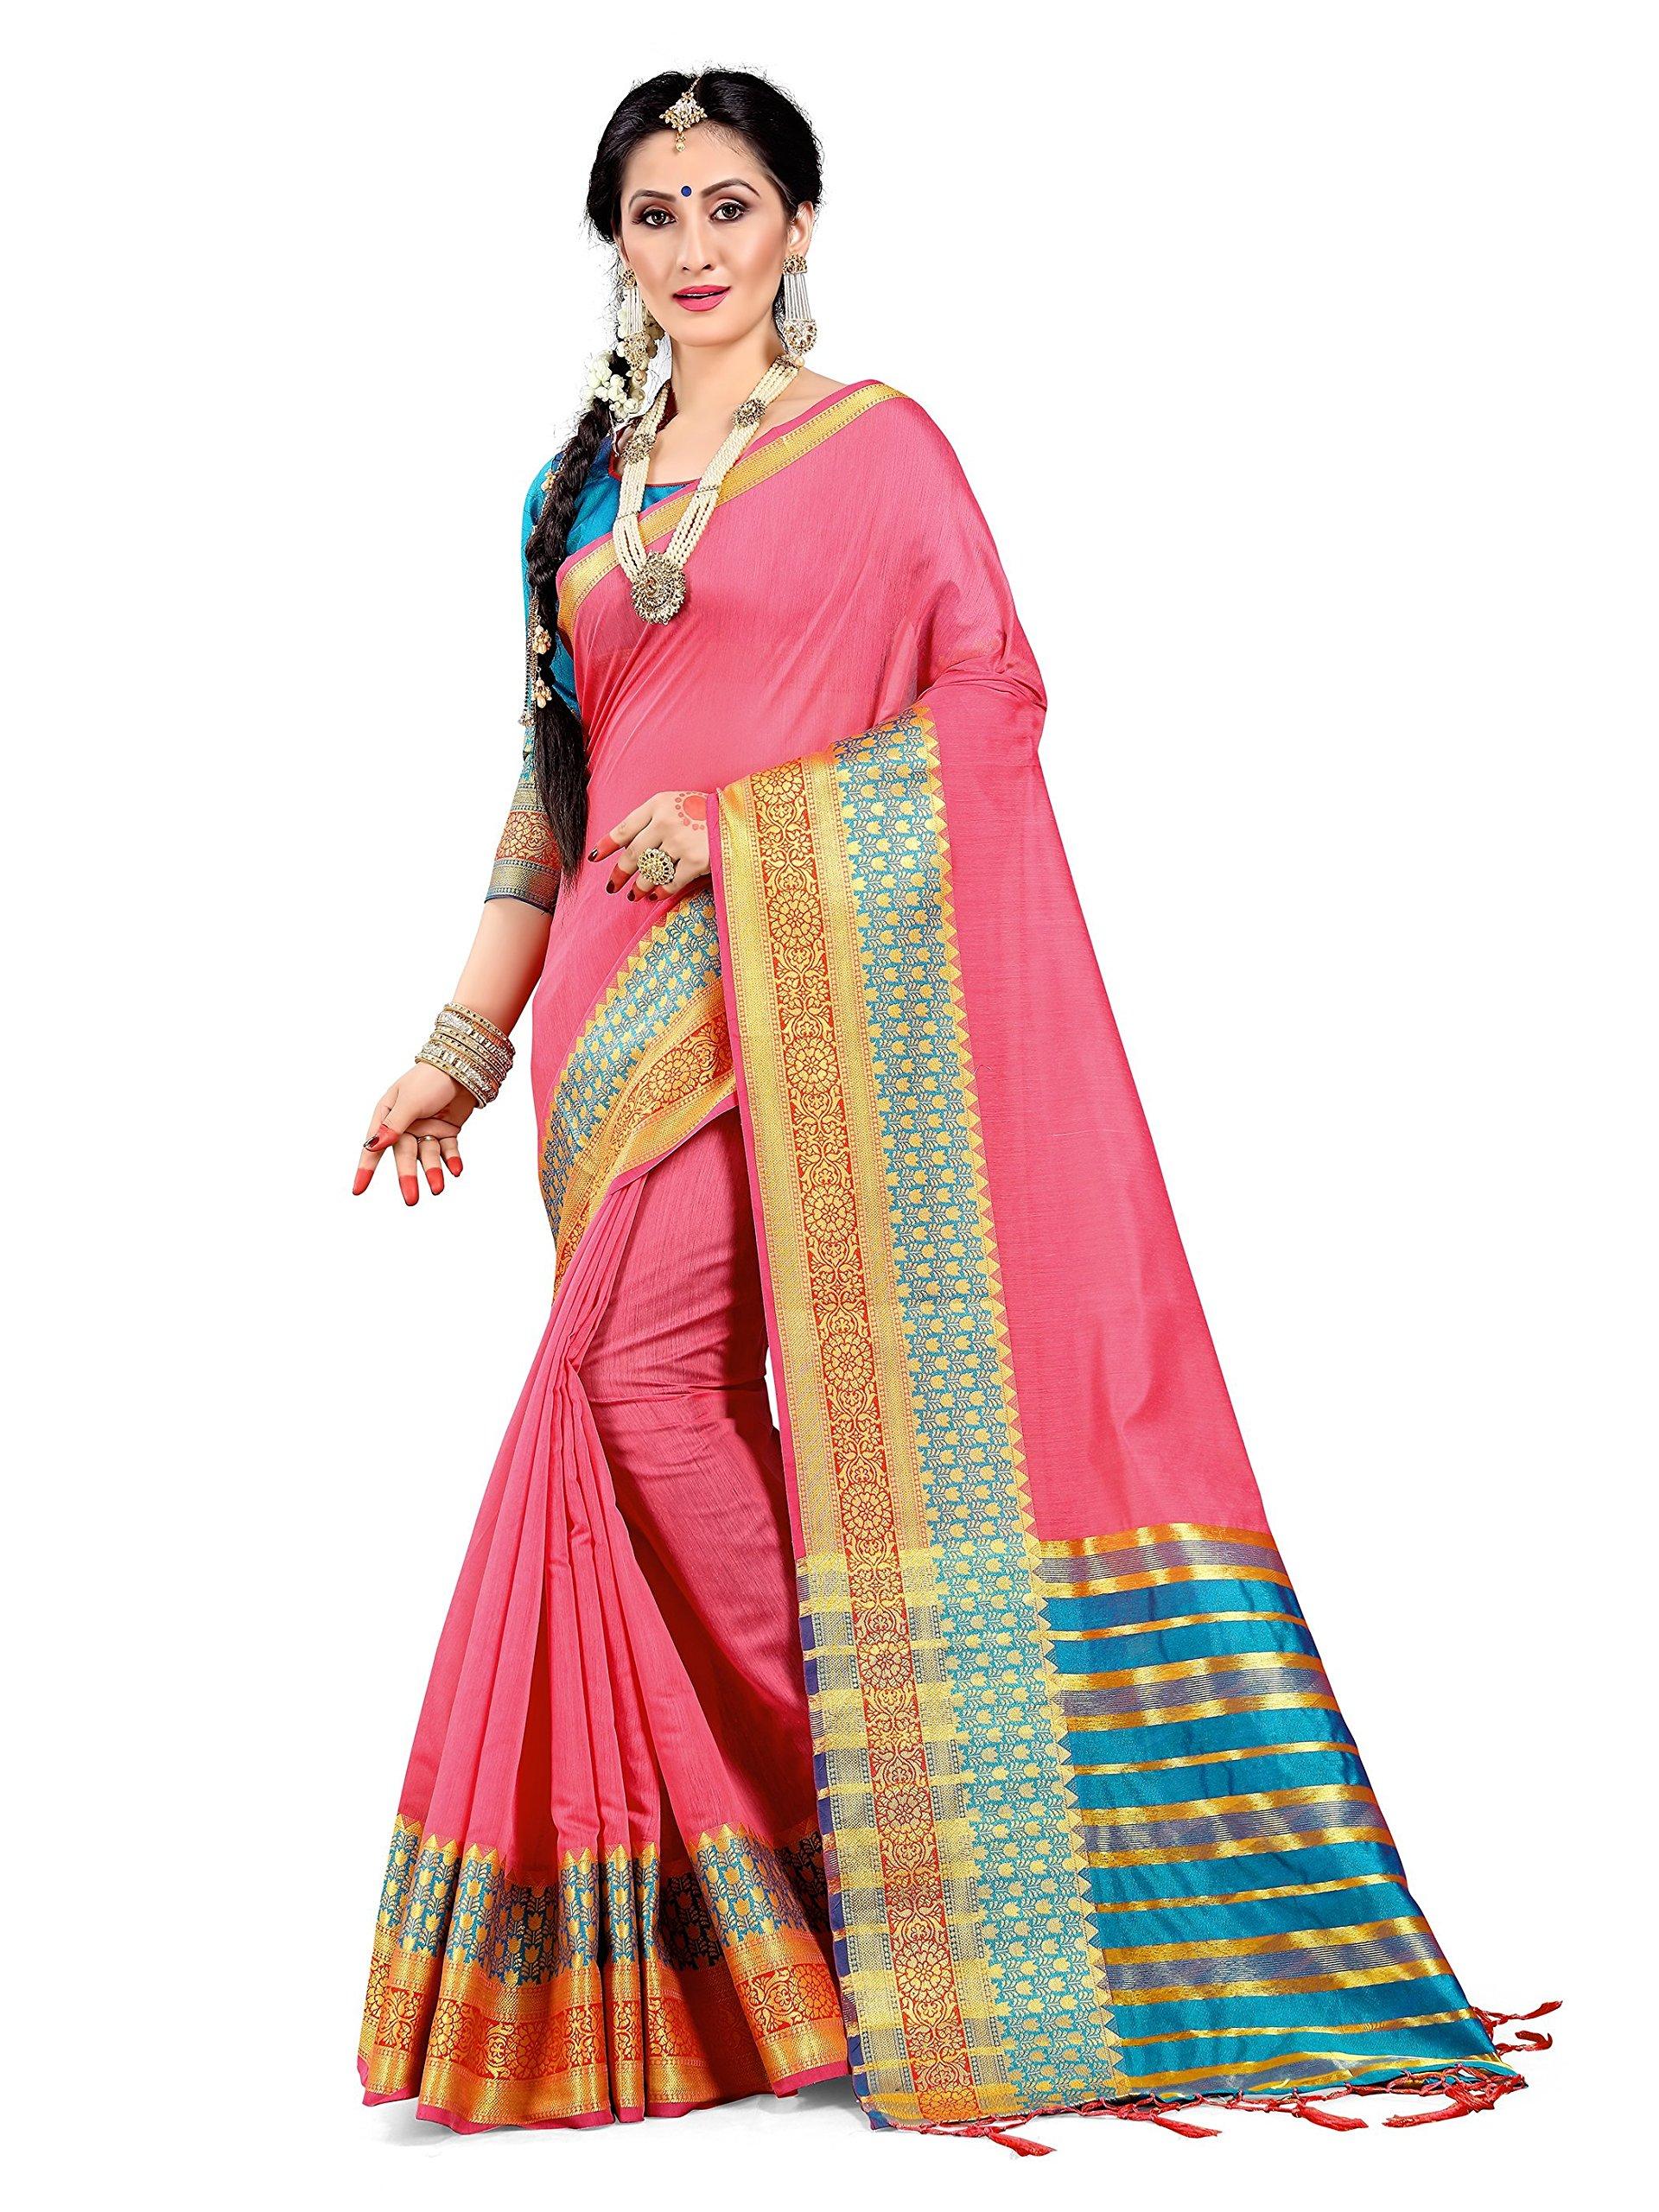 ELINA FASHION Sarees for Women Cotton Silk Woven Saree l Indian Wedding Gift Sari with Unstitched Blouse